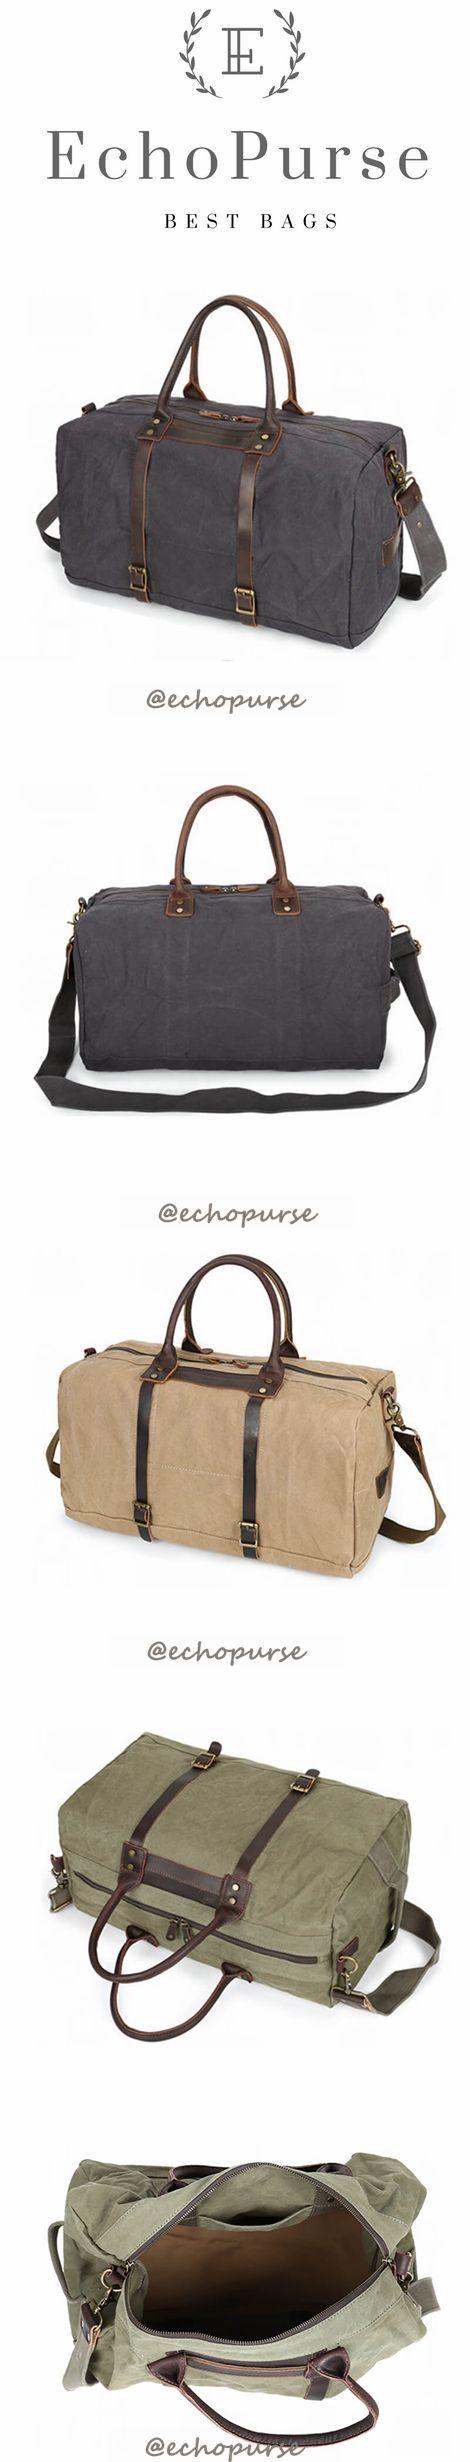 Canvas Duffel Bag, Vintage Travel Handbag, Grey Waterproof Holdall YD189